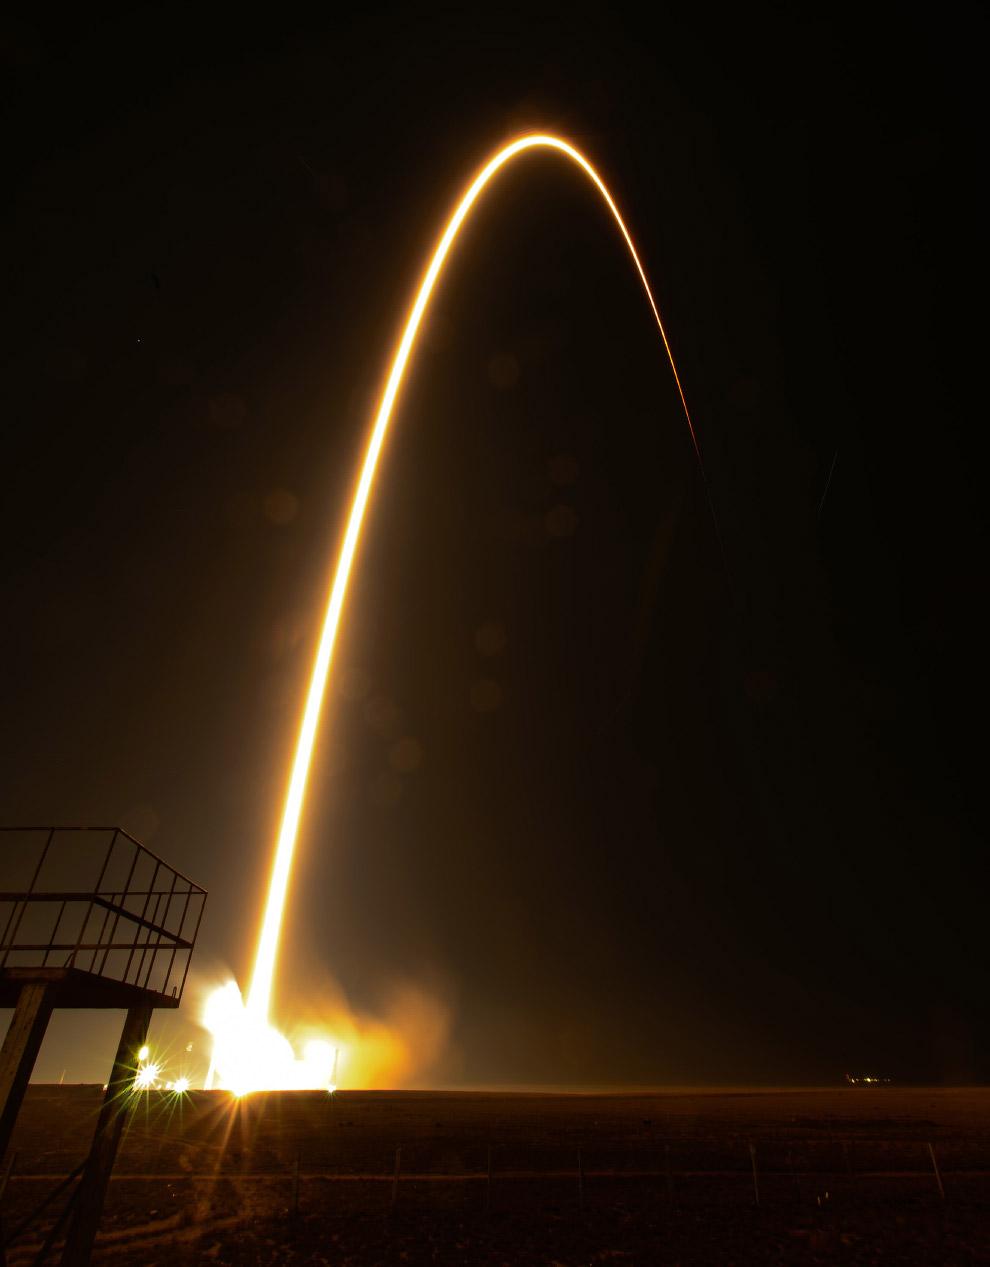 Старт космического корабля «Союз ТМА-12М»